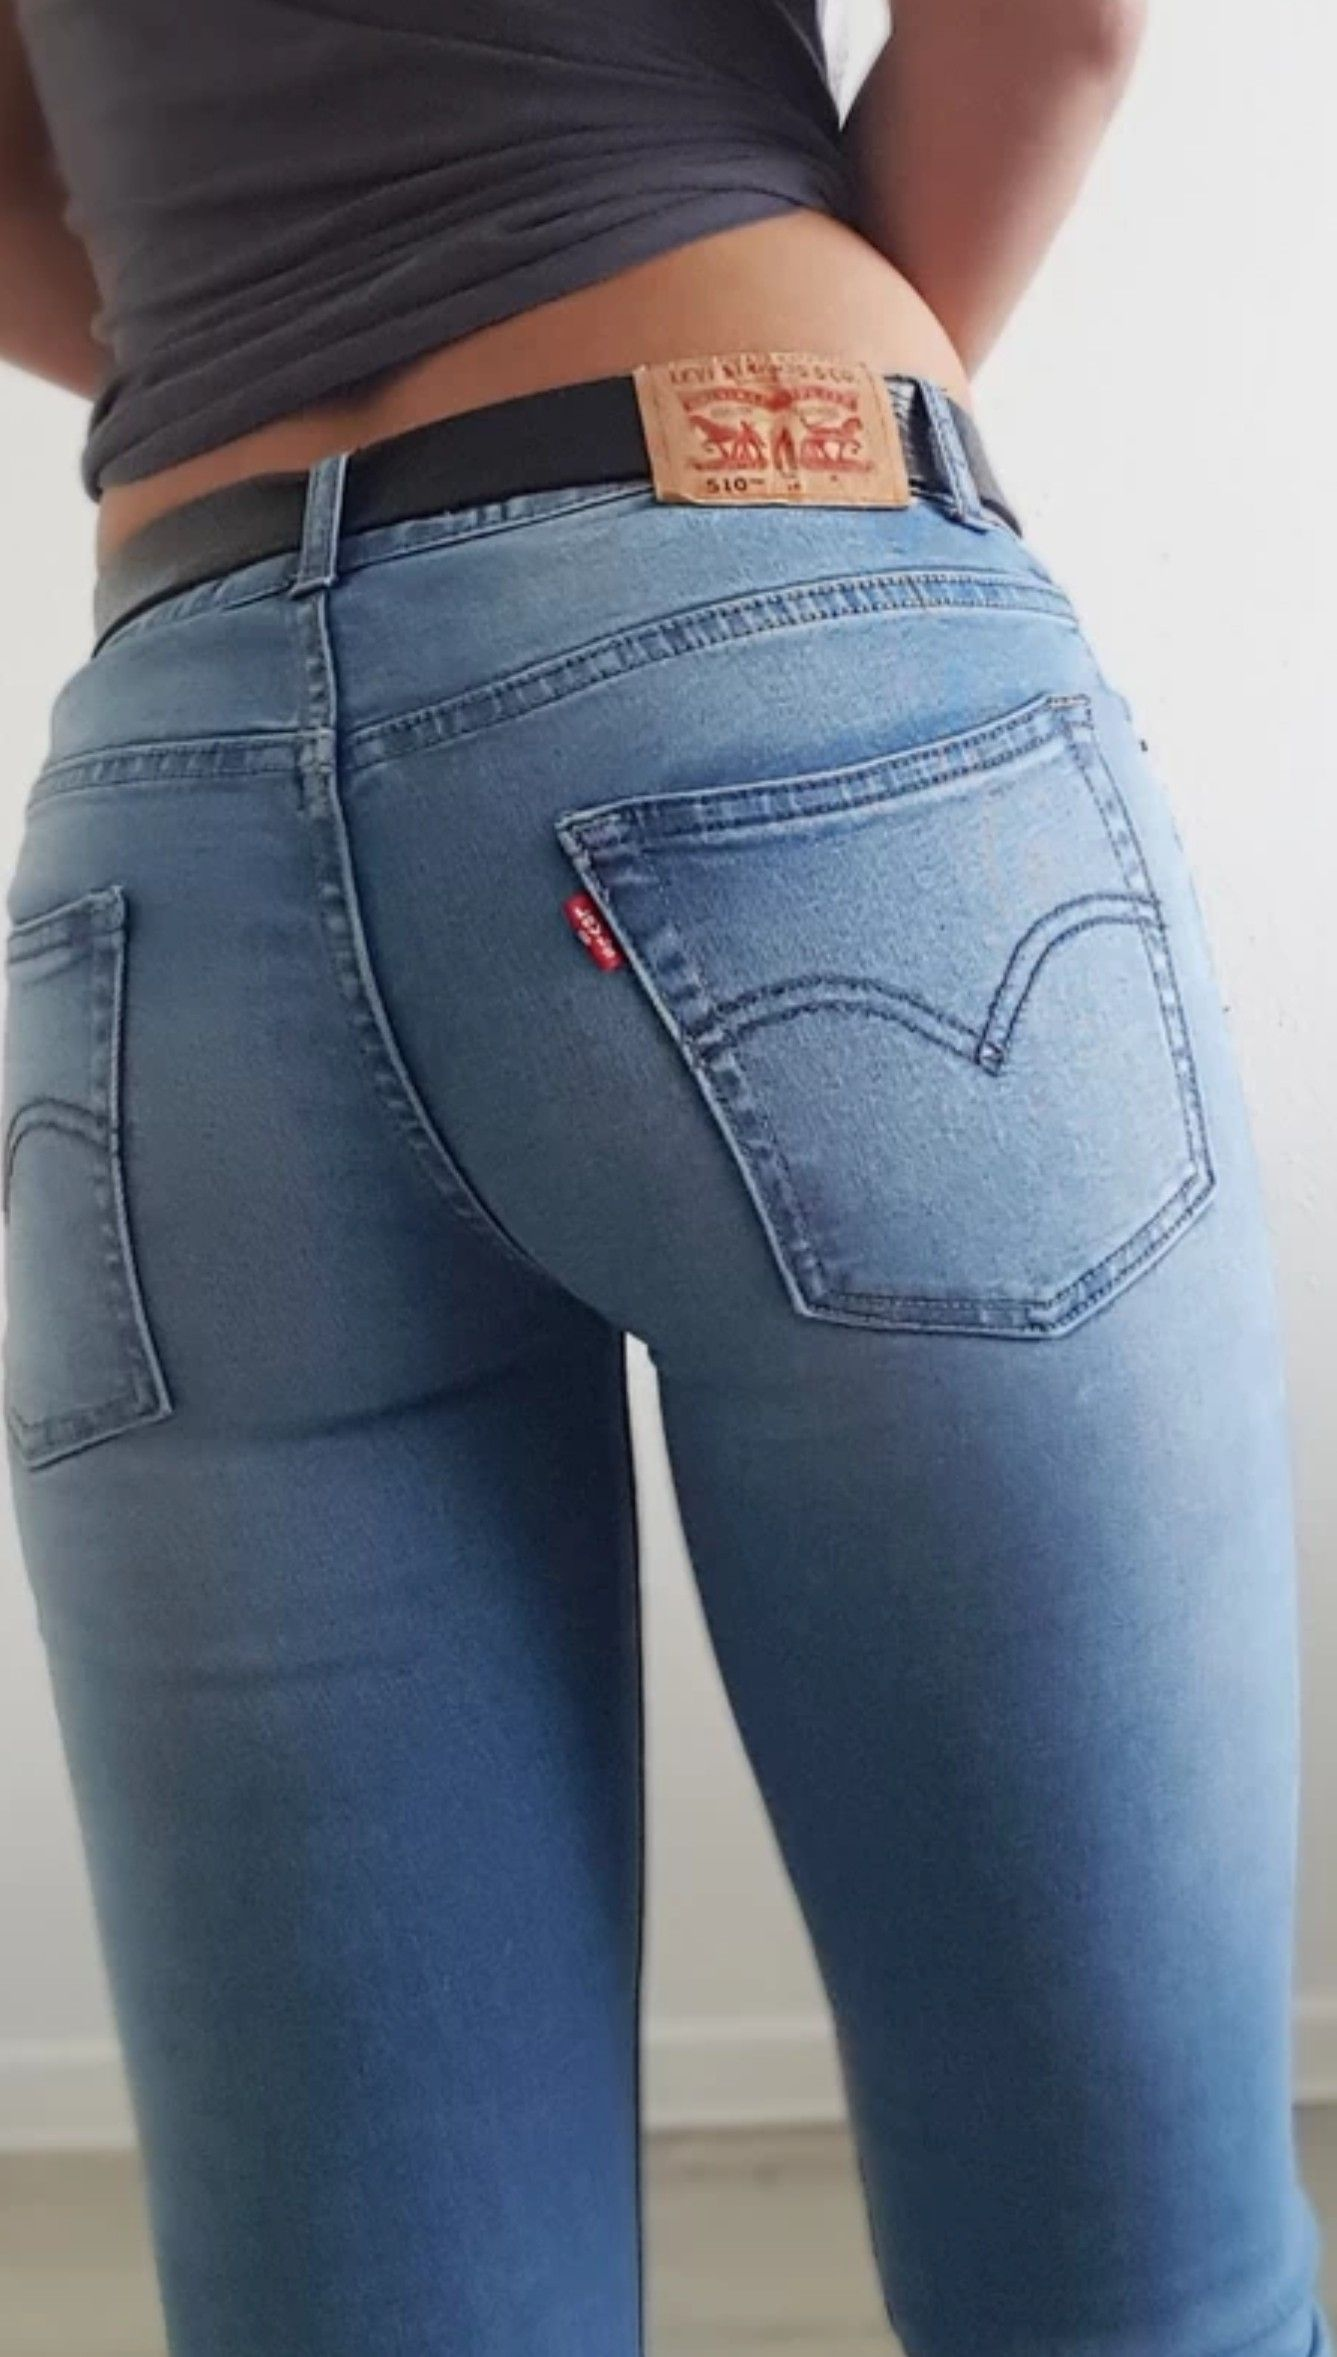 Jeansärsche Jeans. Gratis